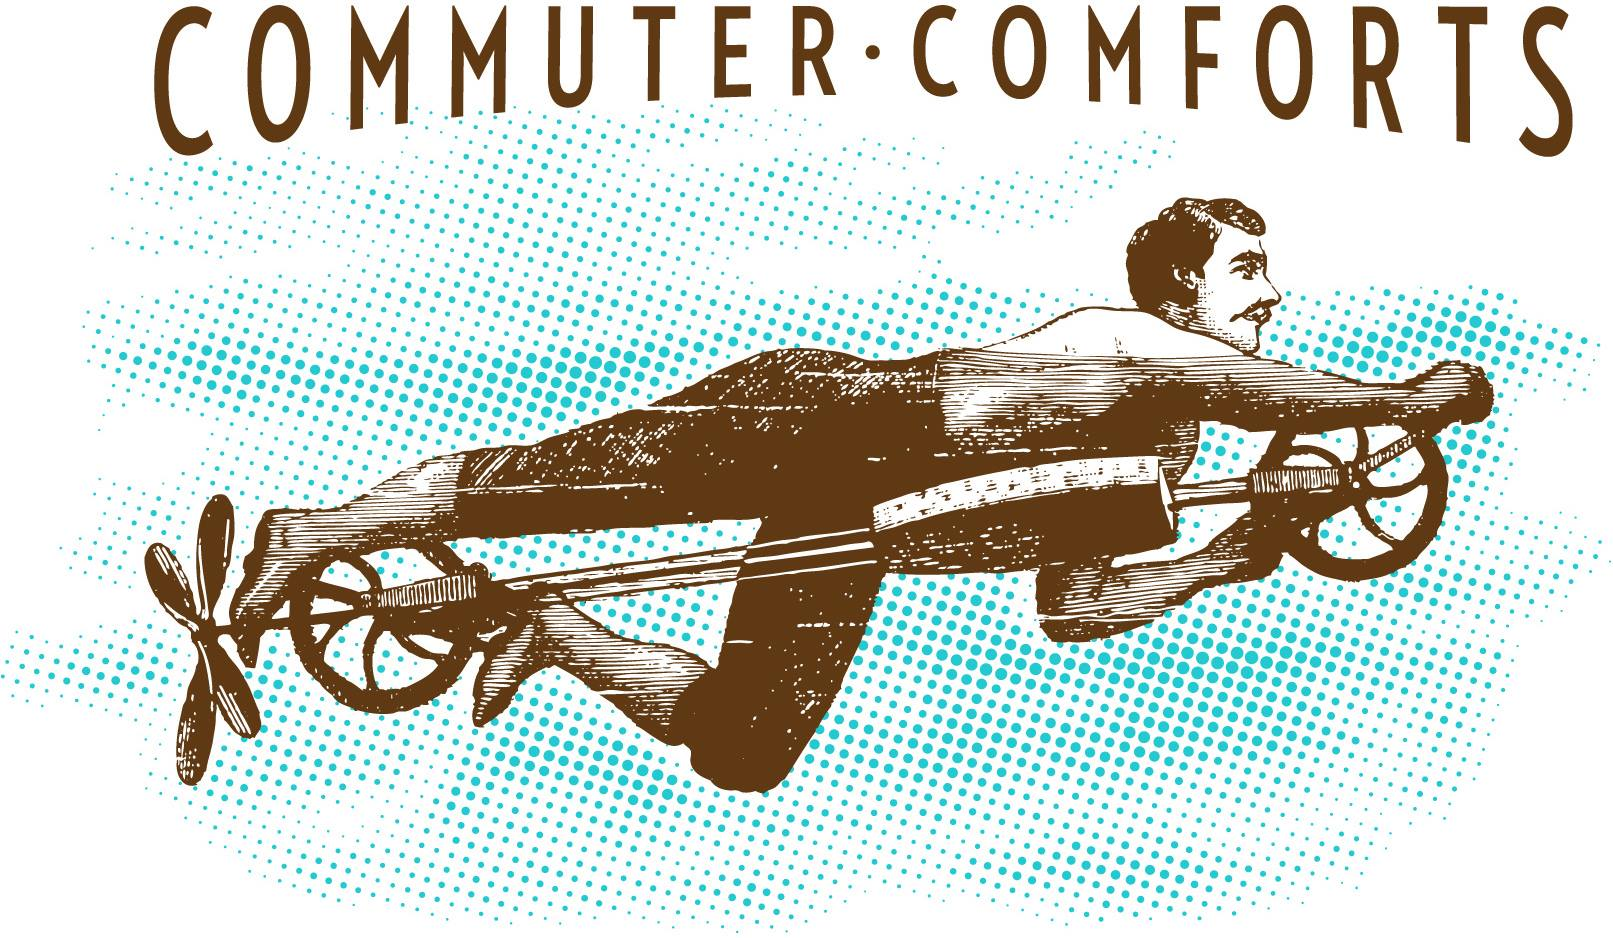 Commuter Comforts